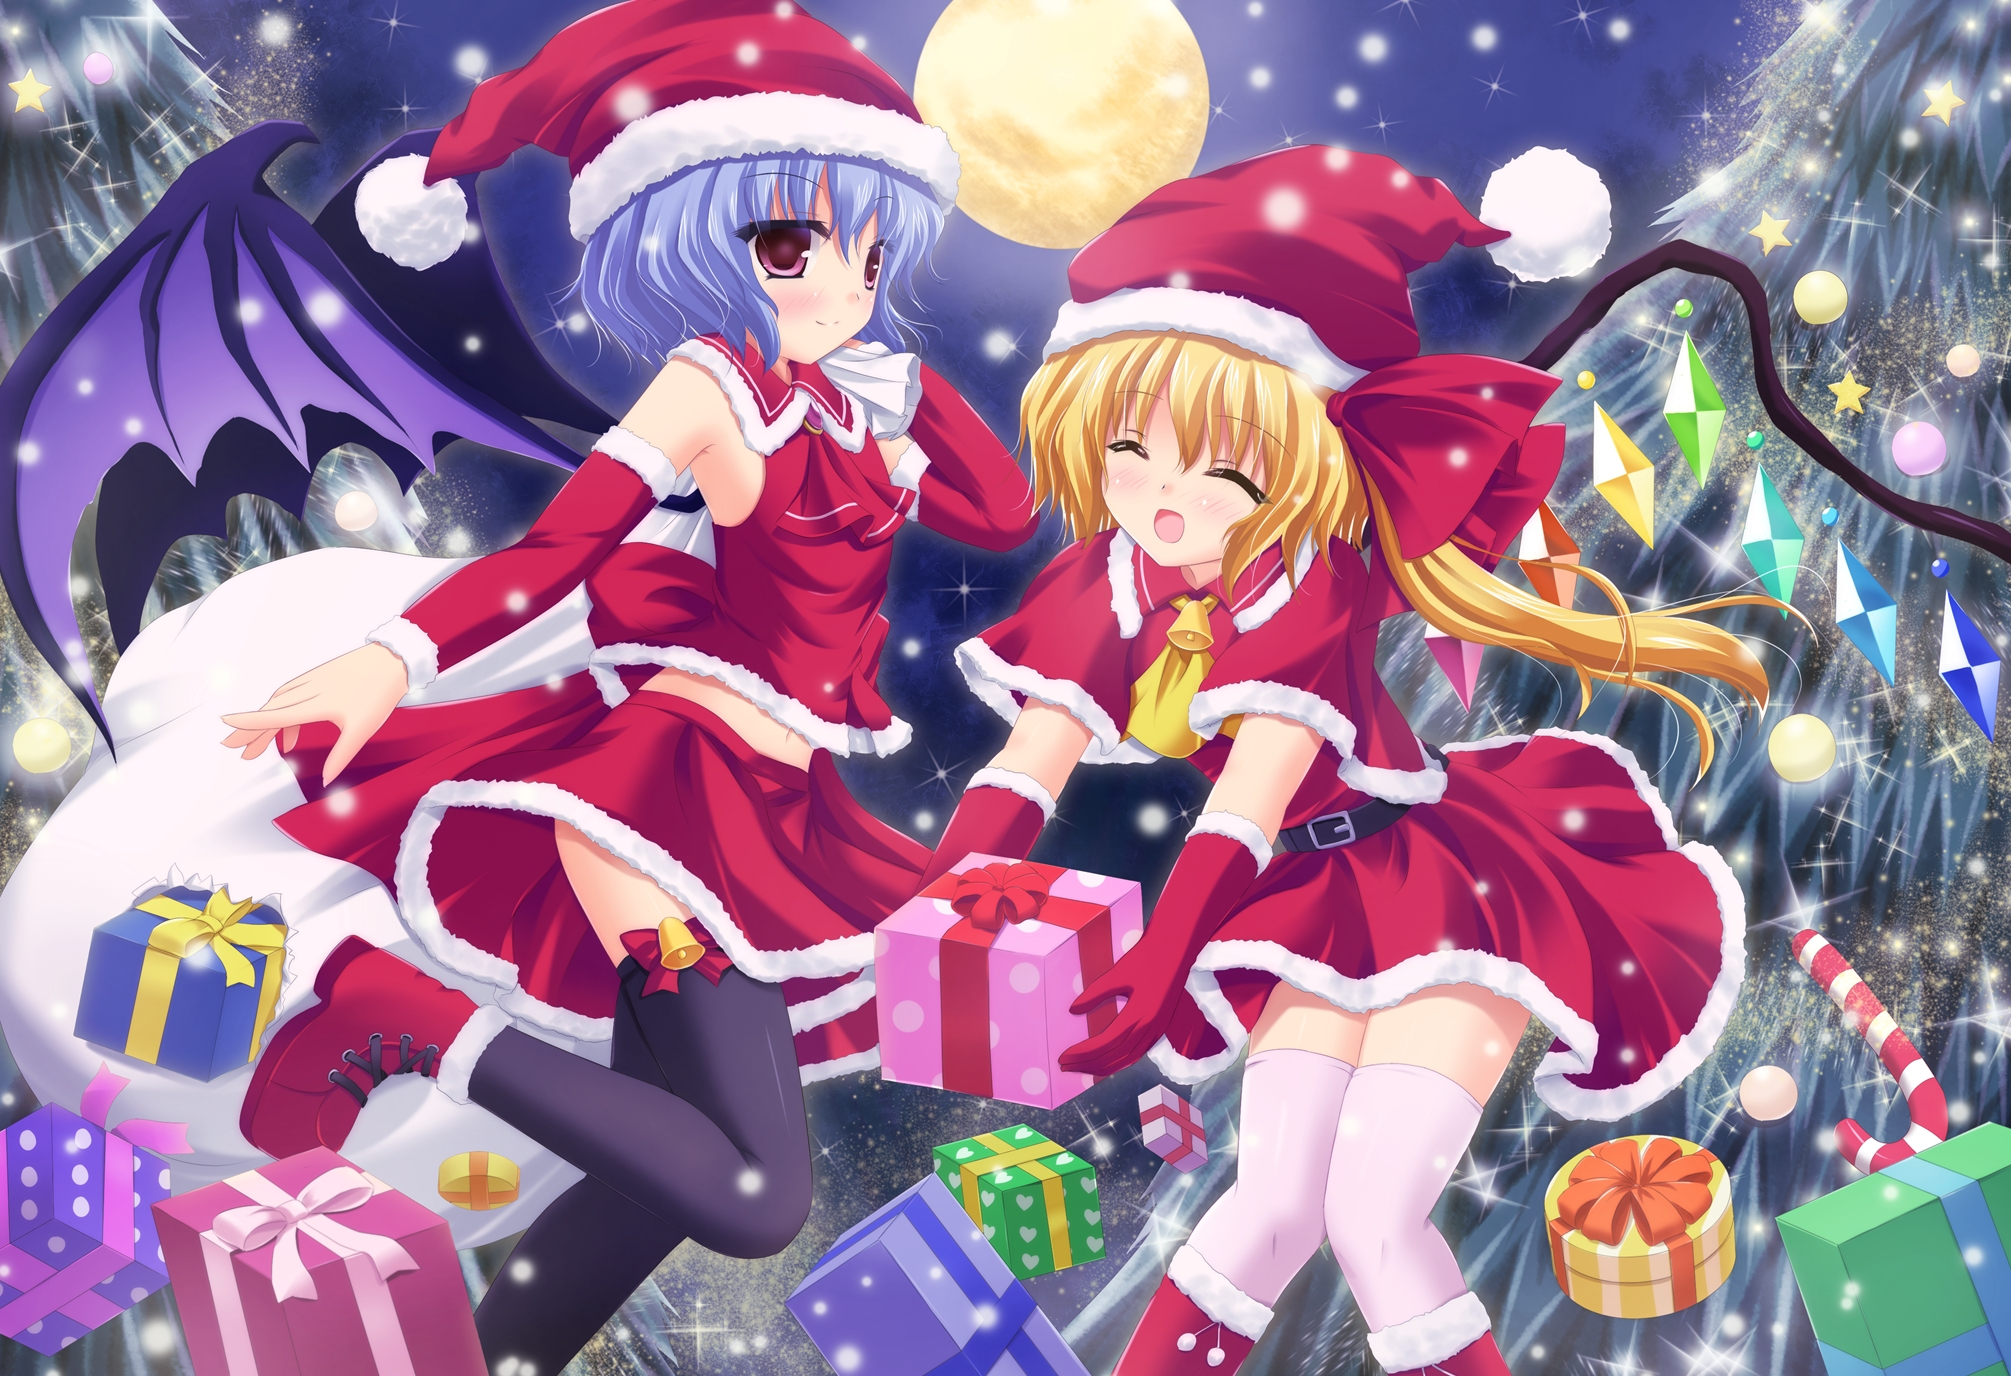 Touhou (Touhou Project) Image #917248 - Zerochan Anime Image Board